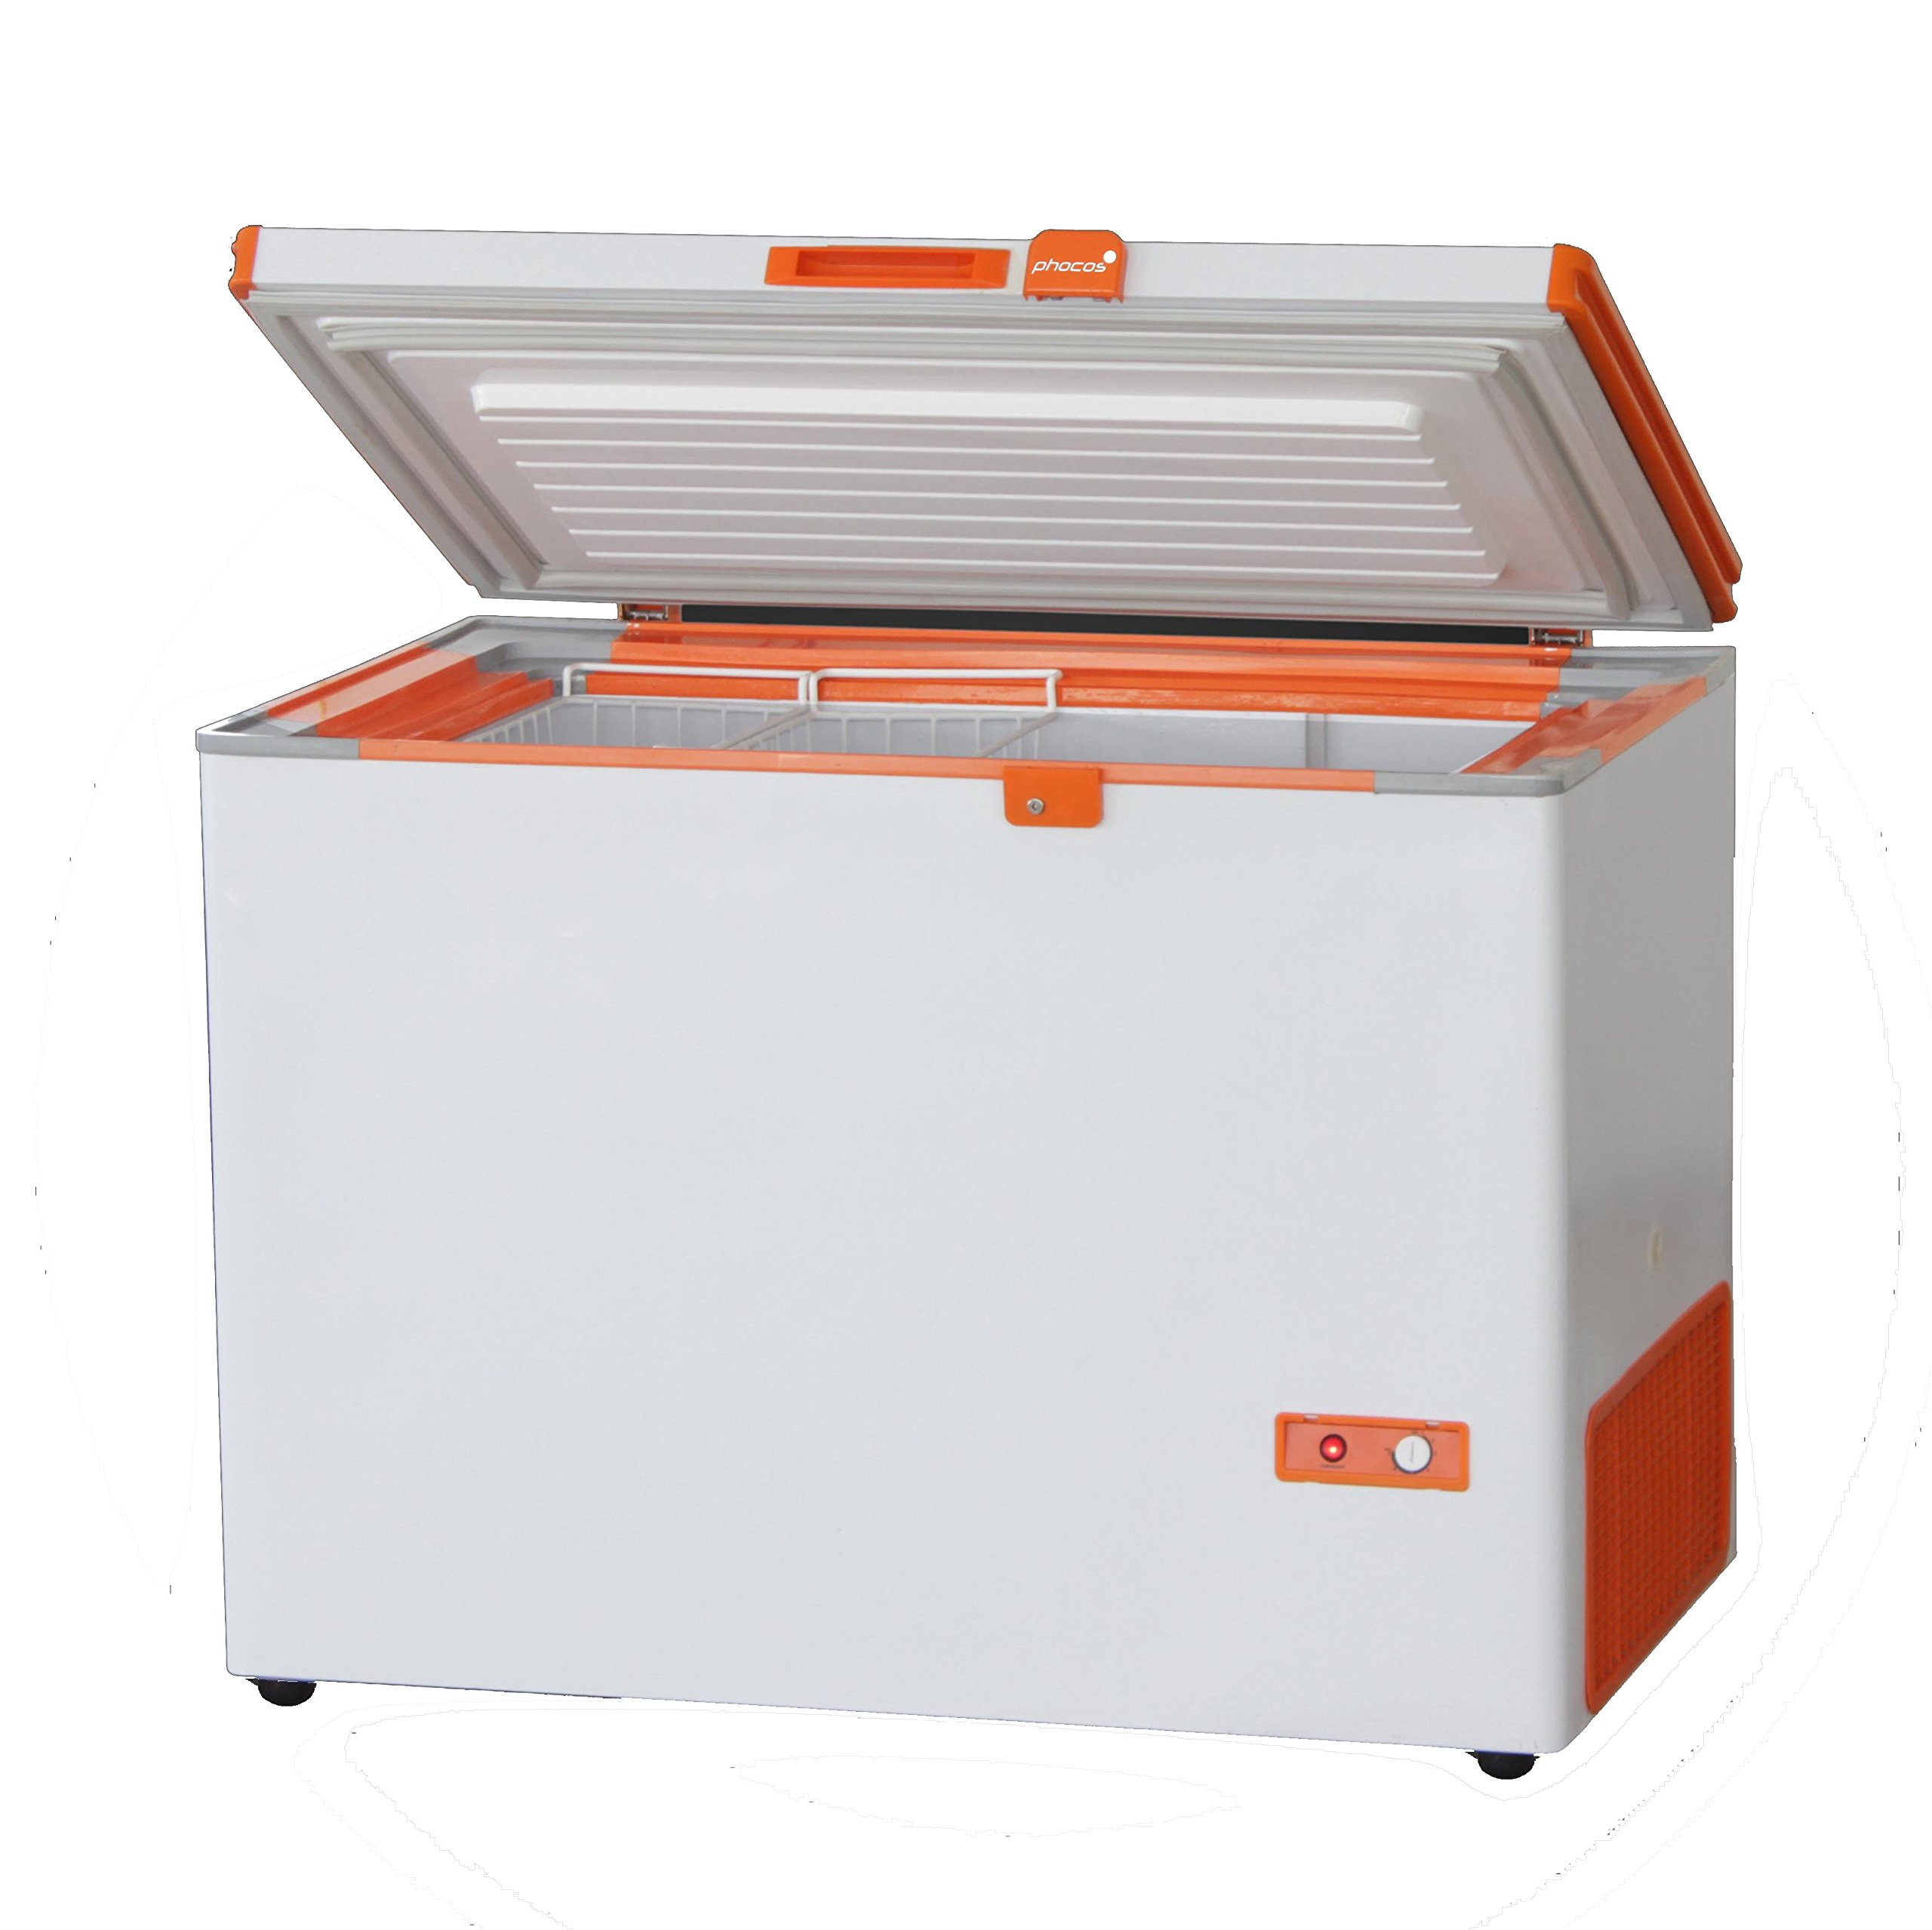 Phocos FR240MP DC Refrigerator/Freezer